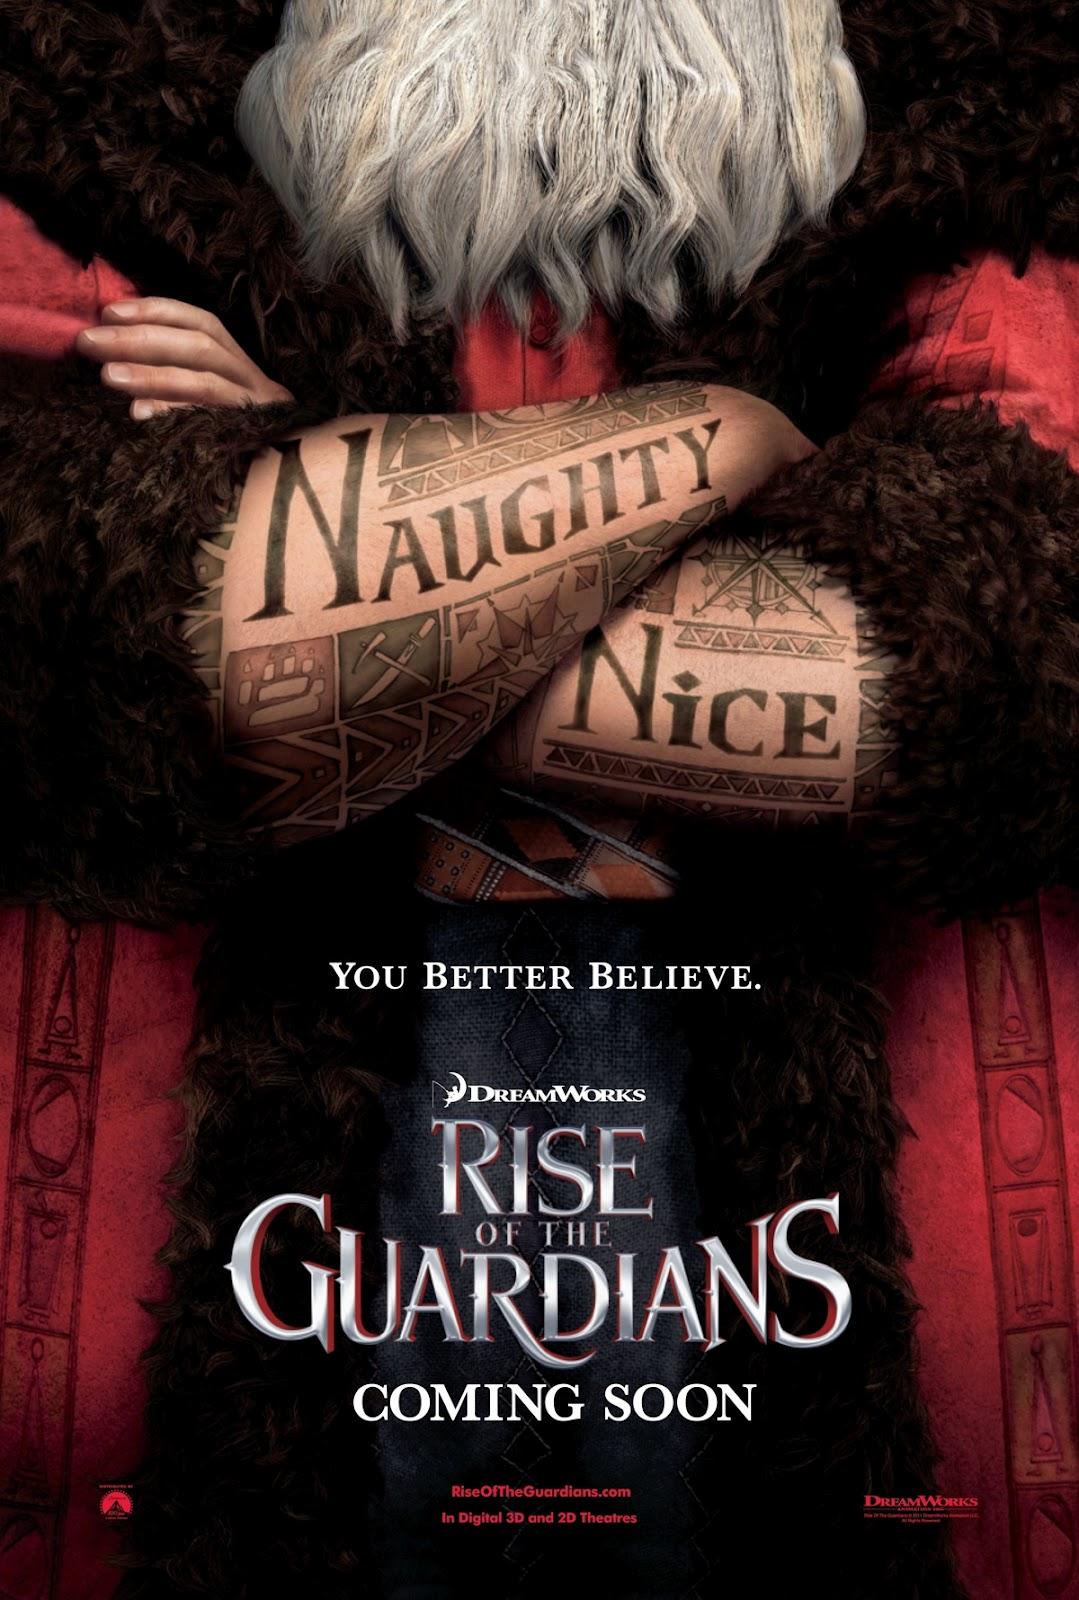 http://2.bp.blogspot.com/-Ow7YvVTByKM/T3Xi1lO84AI/AAAAAAAAFio/gat_G0J-OKY/s1600/Rise-of-the-Guardians_poster-231211.jpg